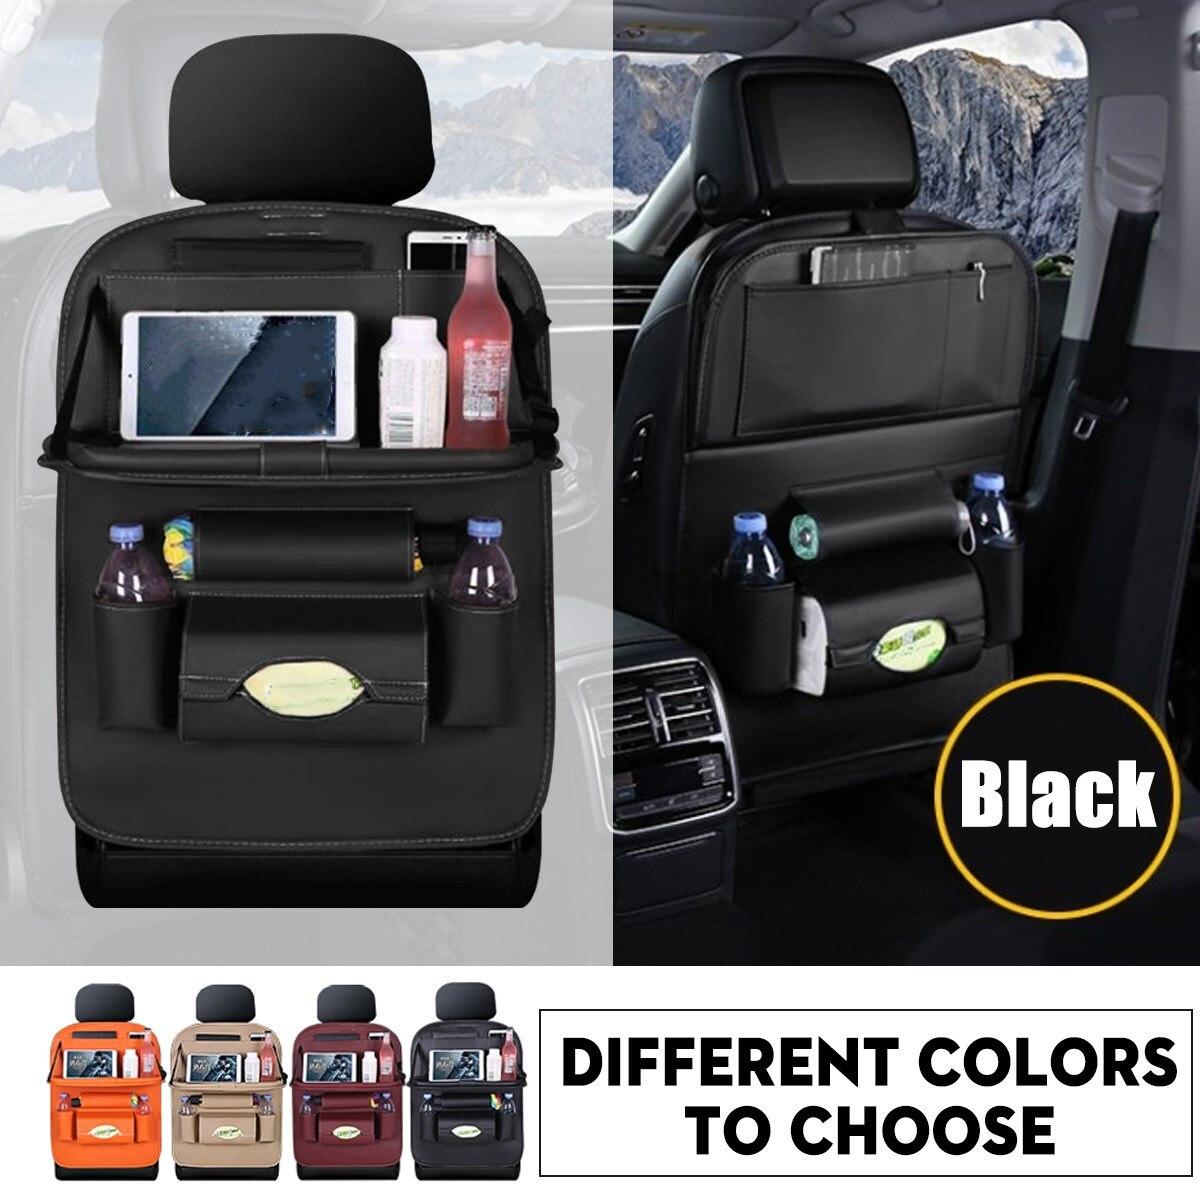 Soporte plegable para taza de coche, organizador Interior para coche, asiento para vehículo multifunción, soporte para teléfono, soporte para bebidas, cajas para comida